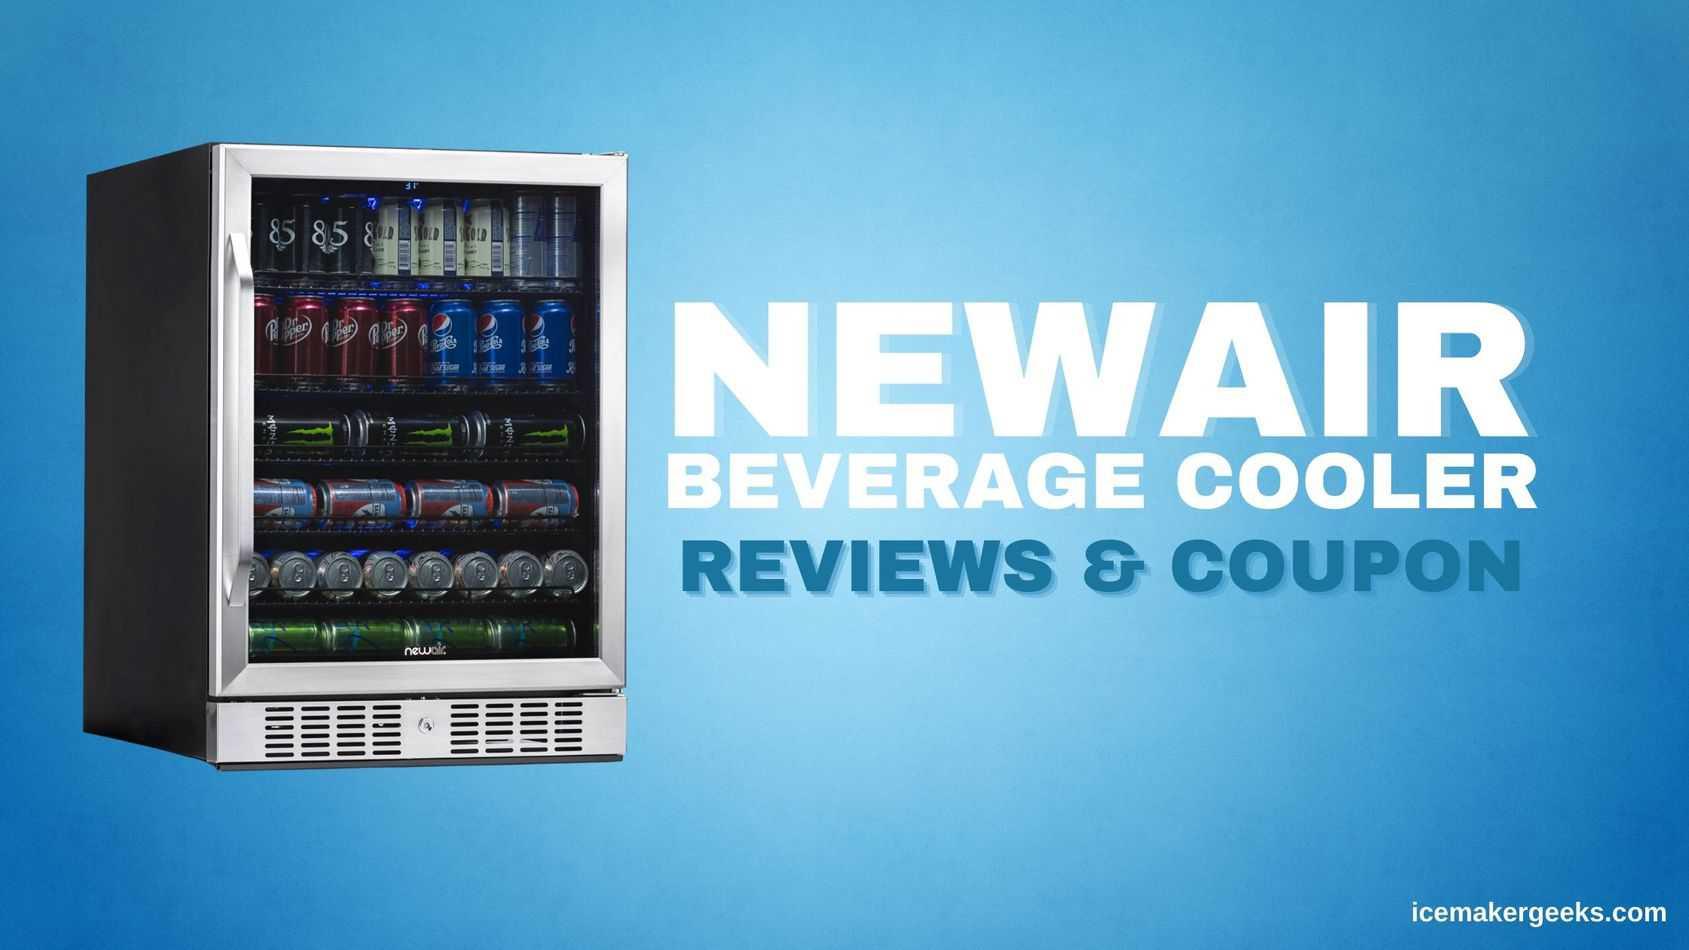 NewAir Beverage Cooler Reviews